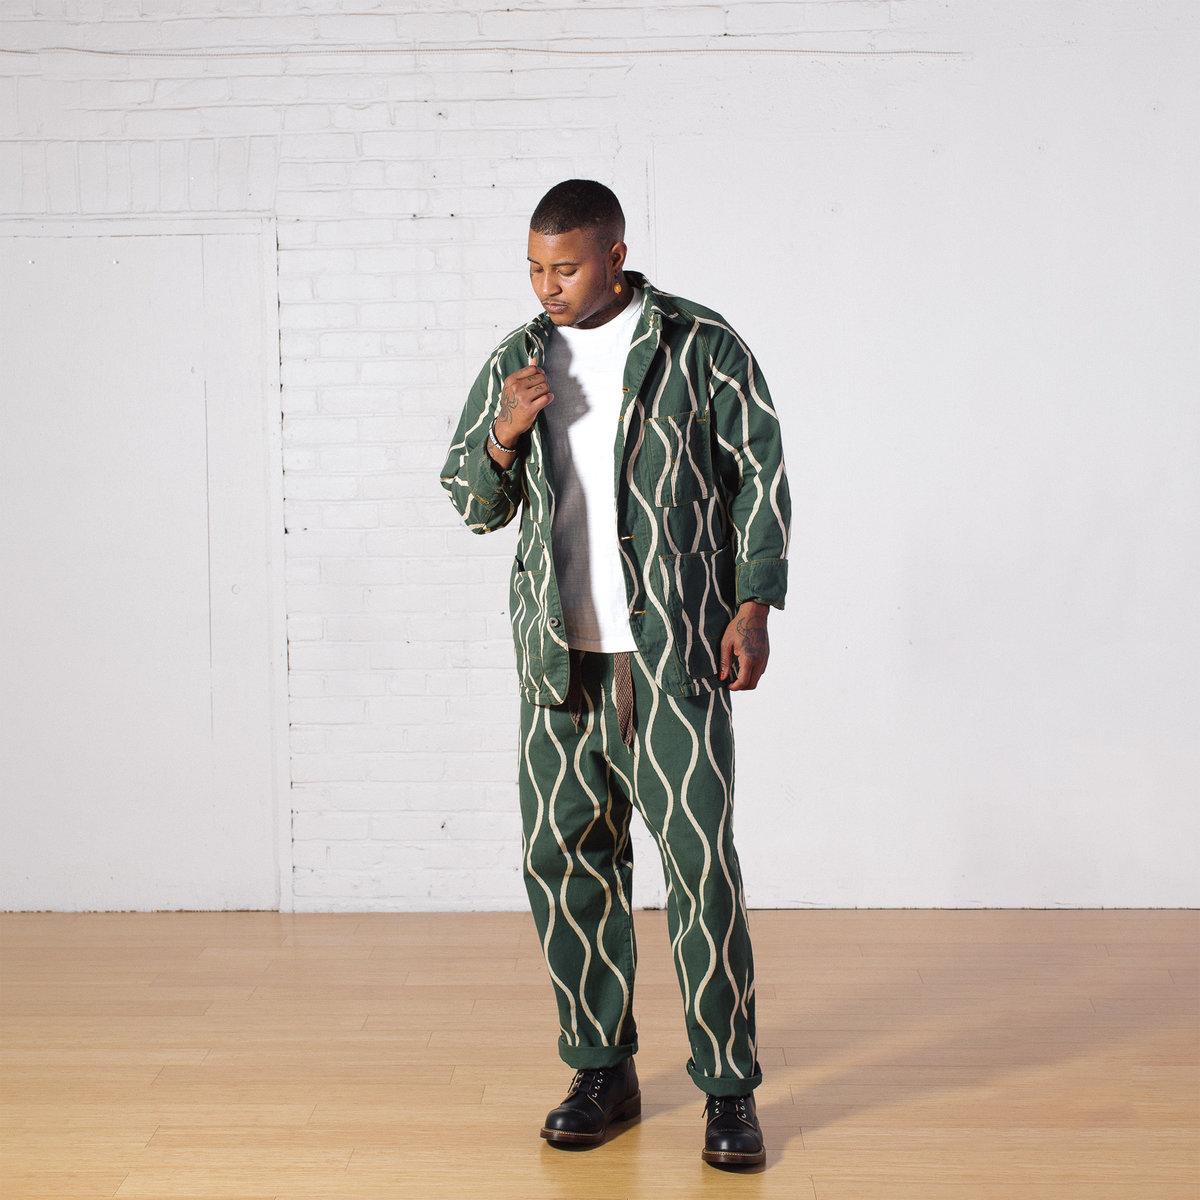 kapital-Cotton-Linen Canvas Drunken Stripe Cactus Coverall Jacket - Green-Onbody-09.jpg